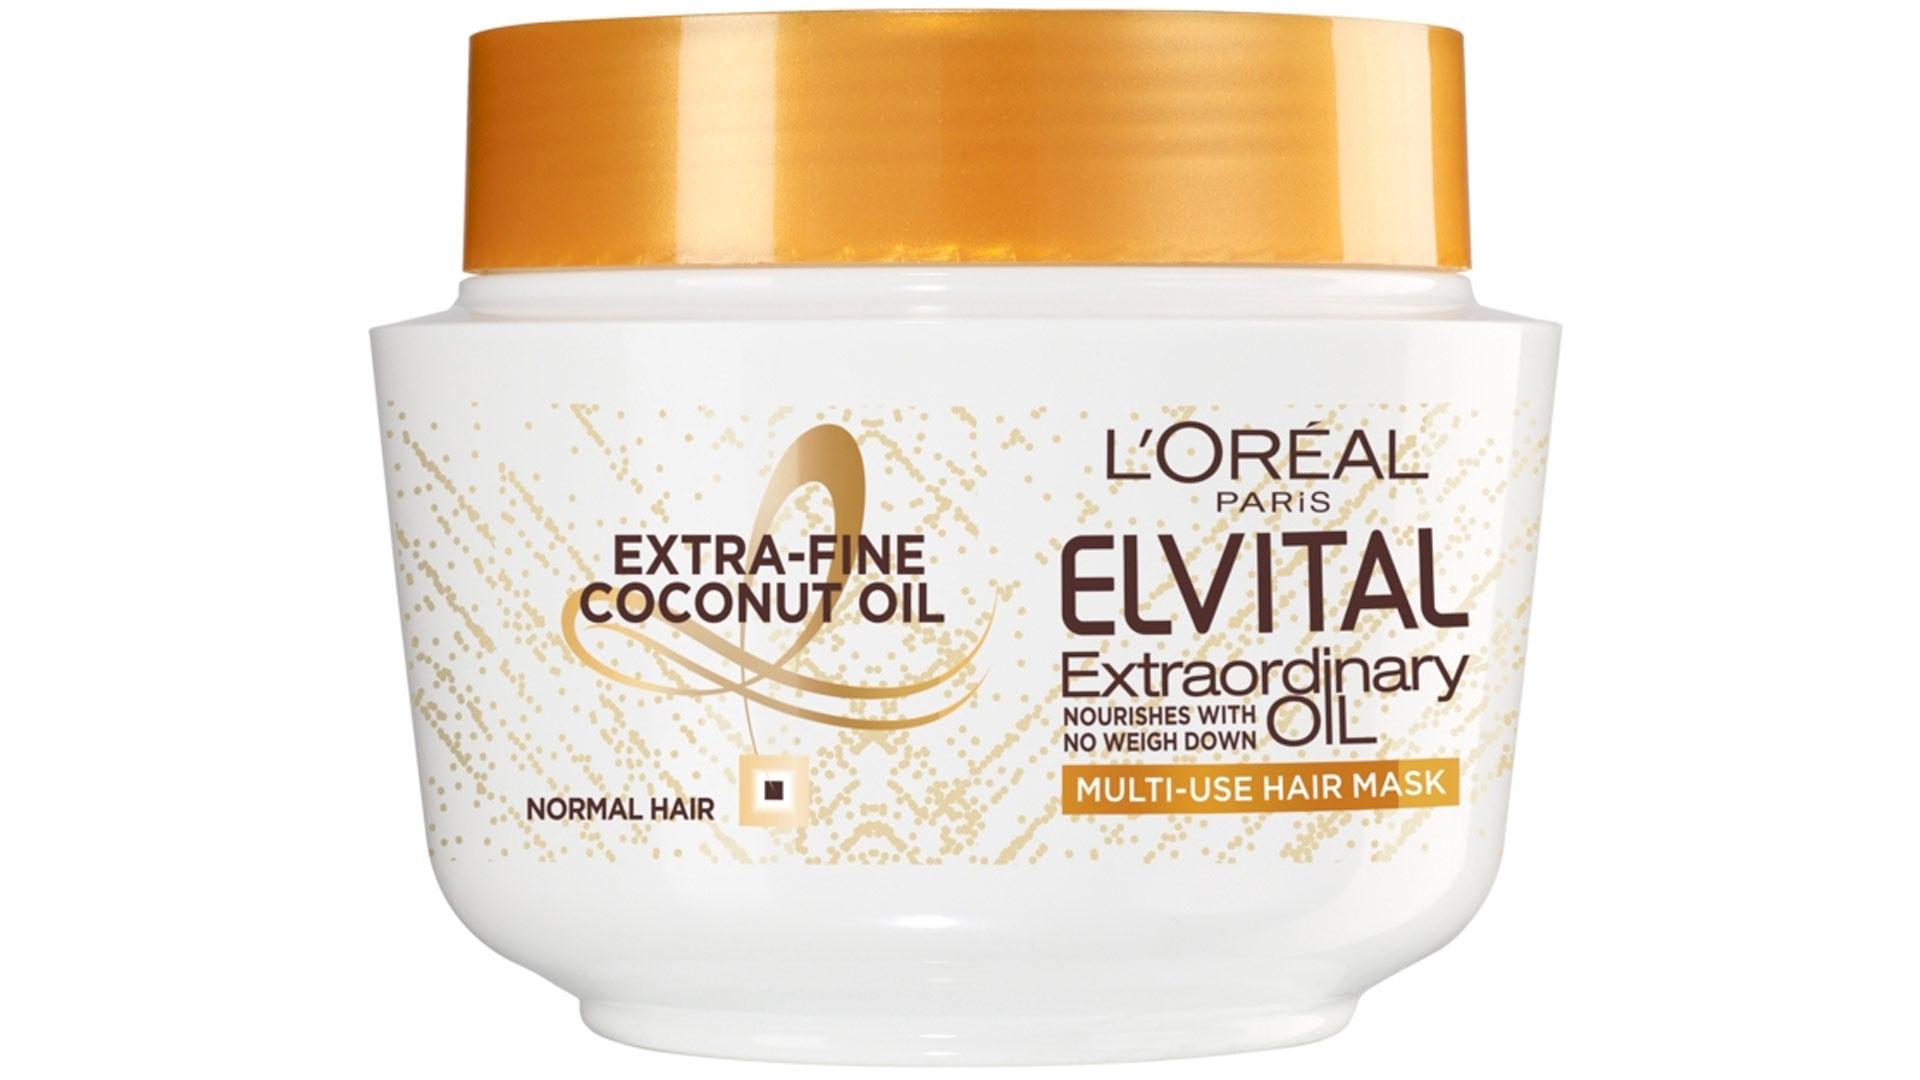 Elvital extraordinary oil